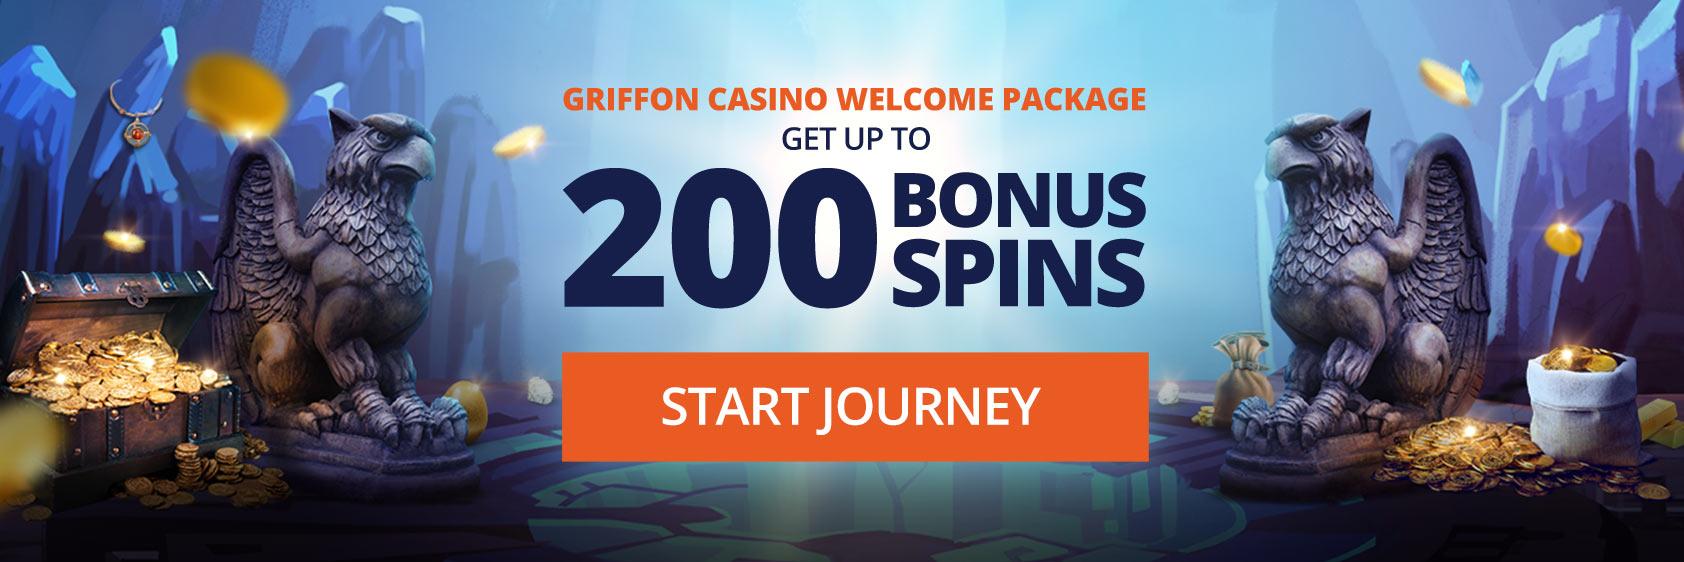 griffon casino welcome bonus